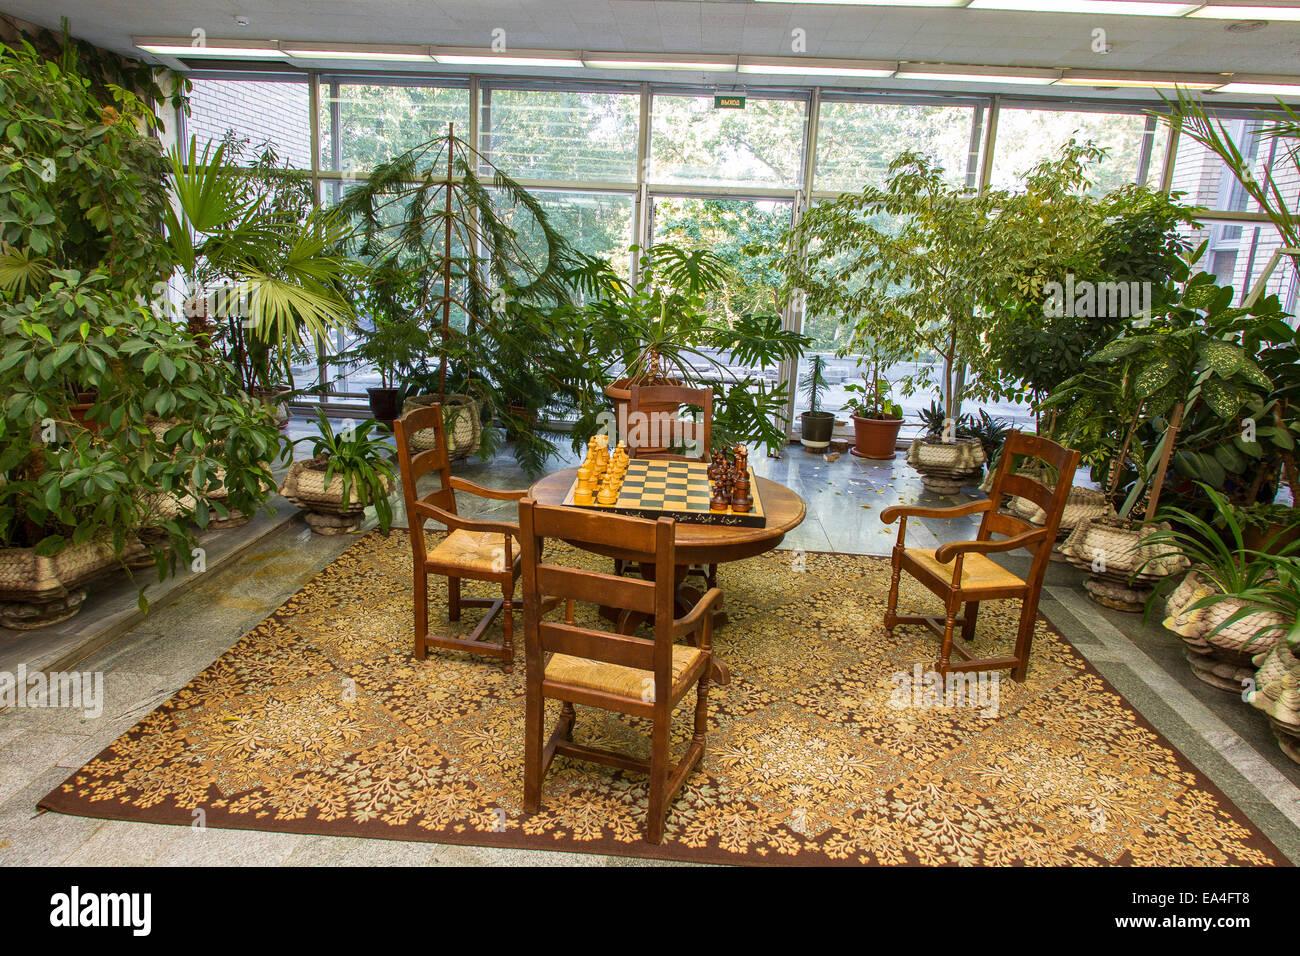 Reception Carpet Stockfotos & Reception Carpet Bilder - Alamy